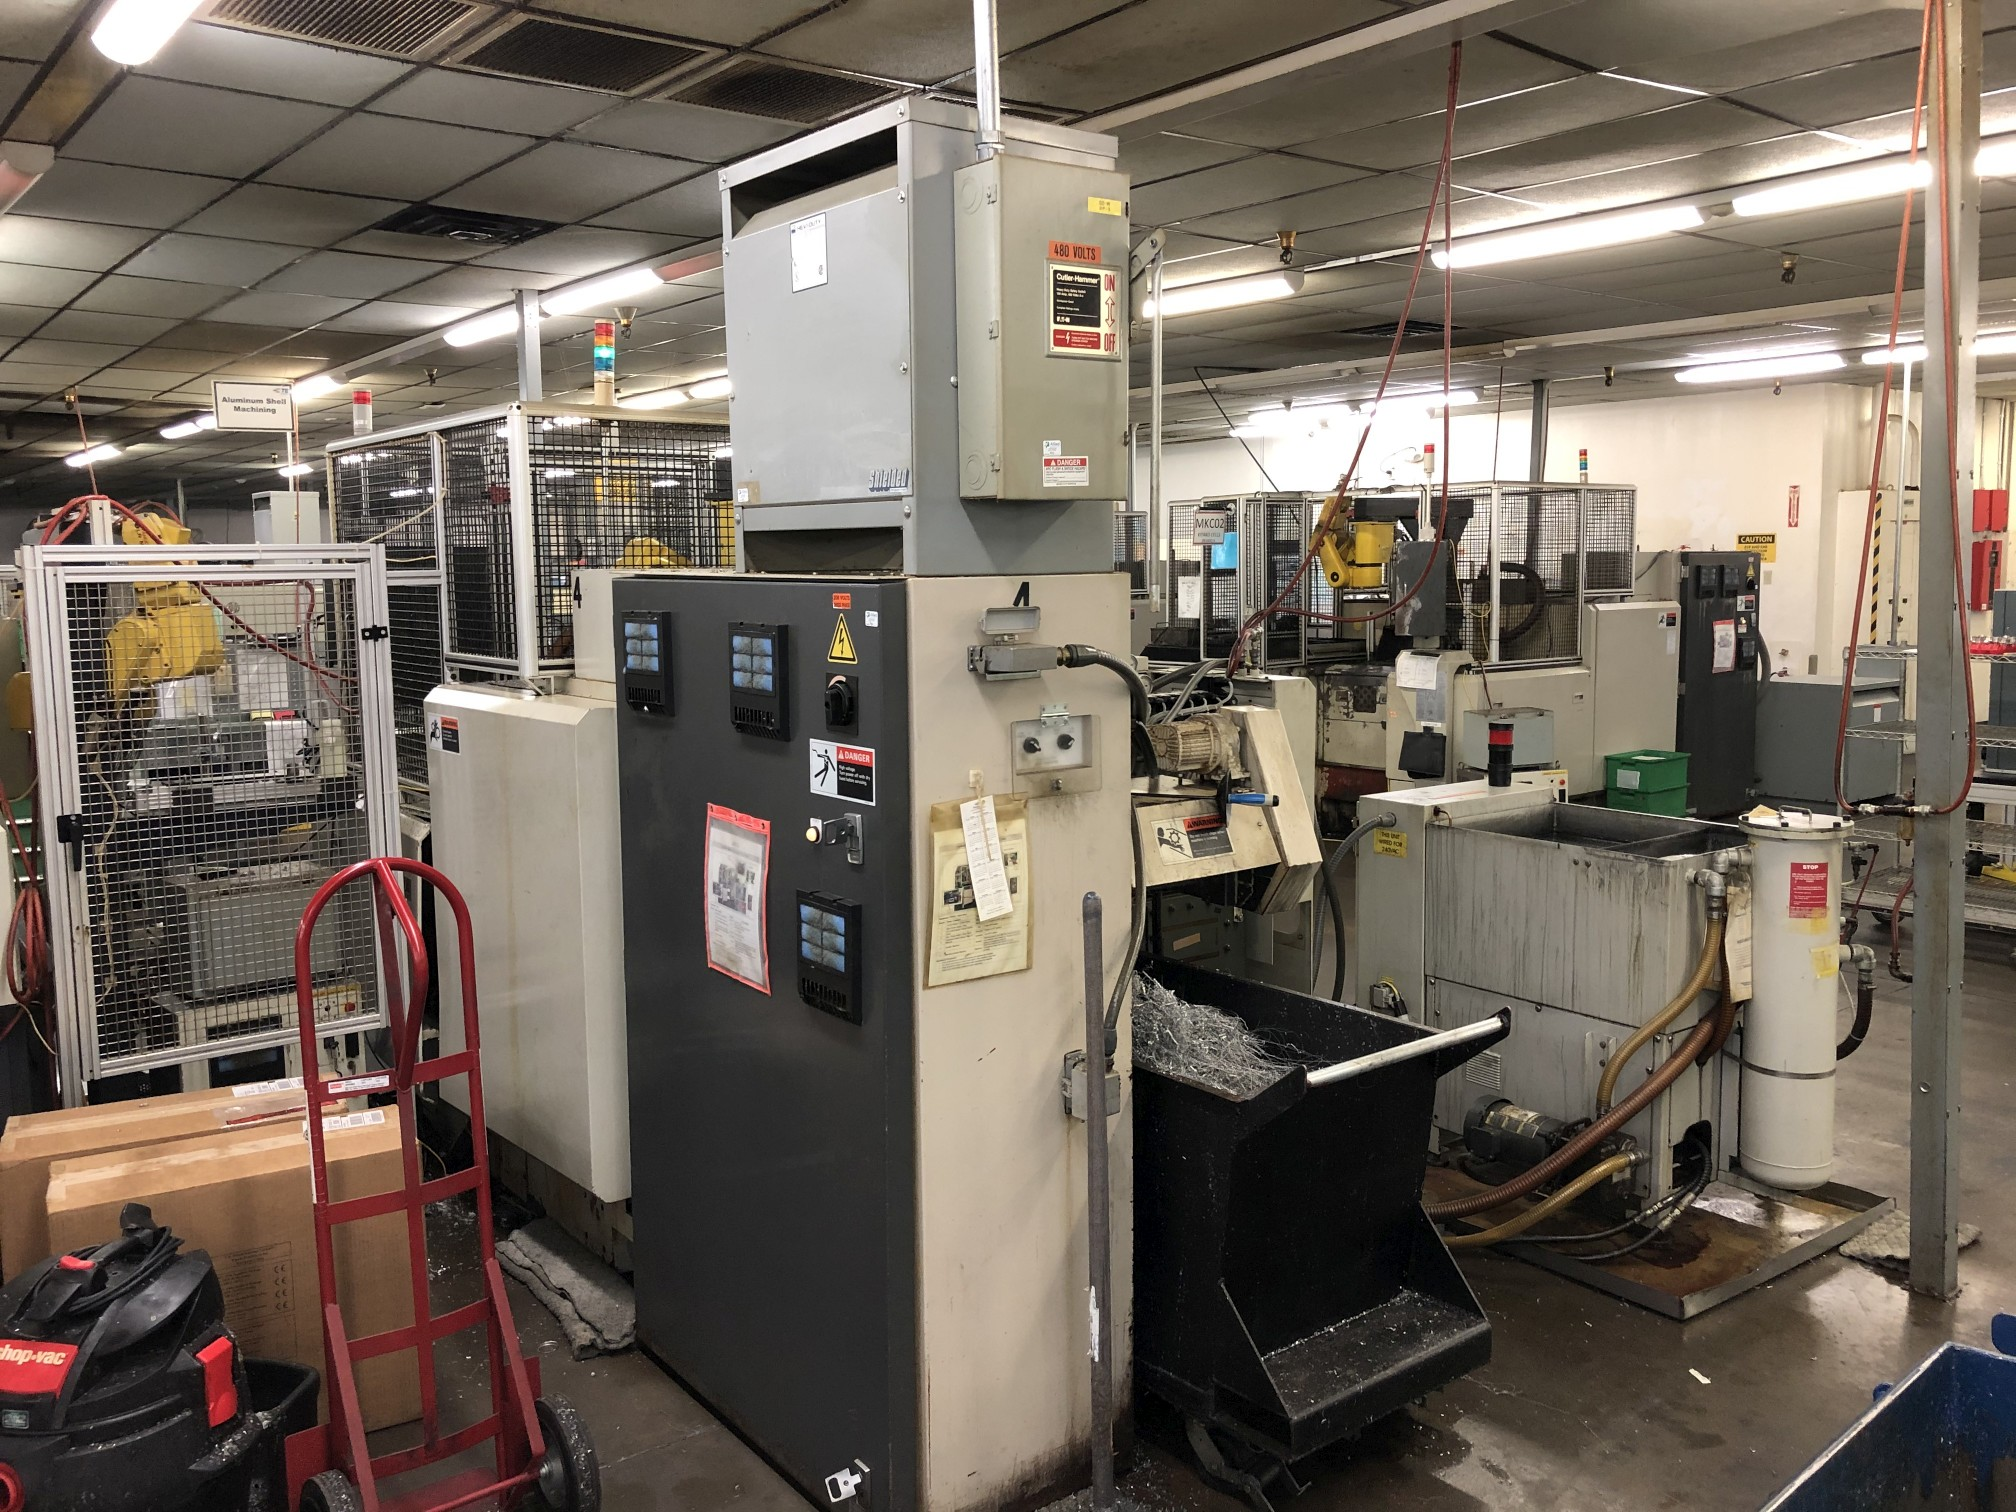 1999 Kitako MT4-200M Multi-Spindle CNC Turning Mill - Image 16 of 19